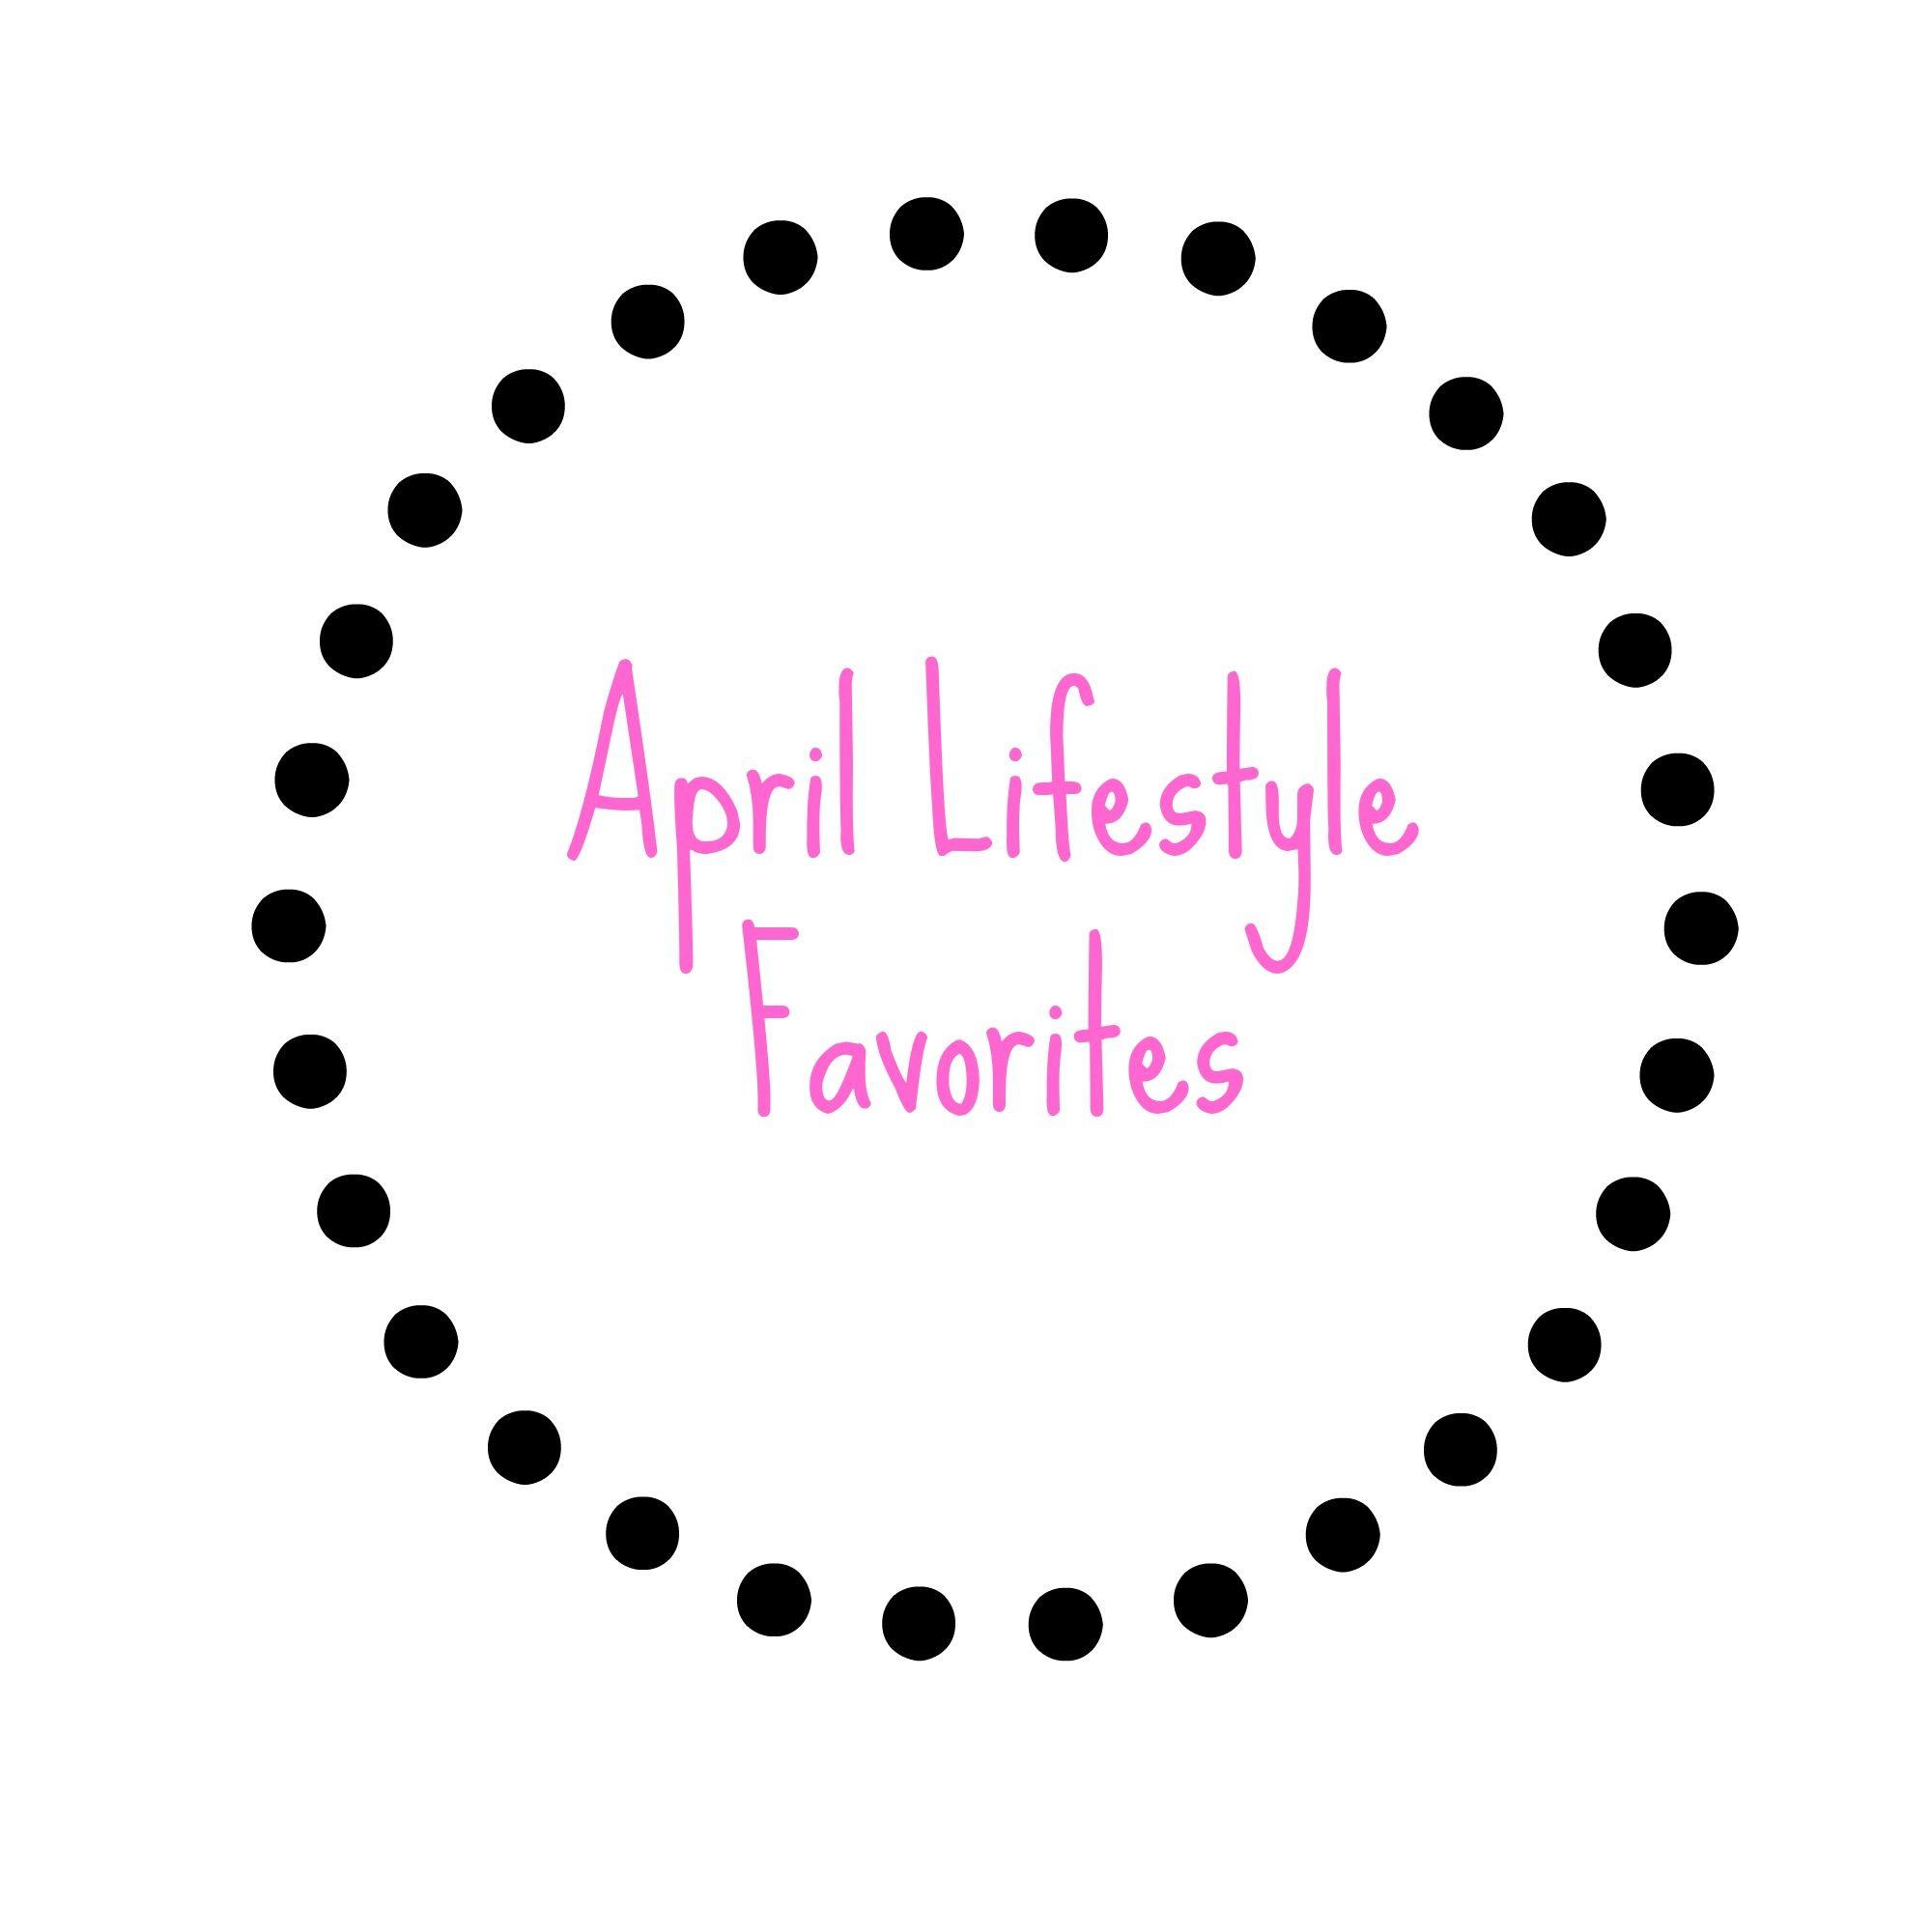 April Lifestyle Favorites